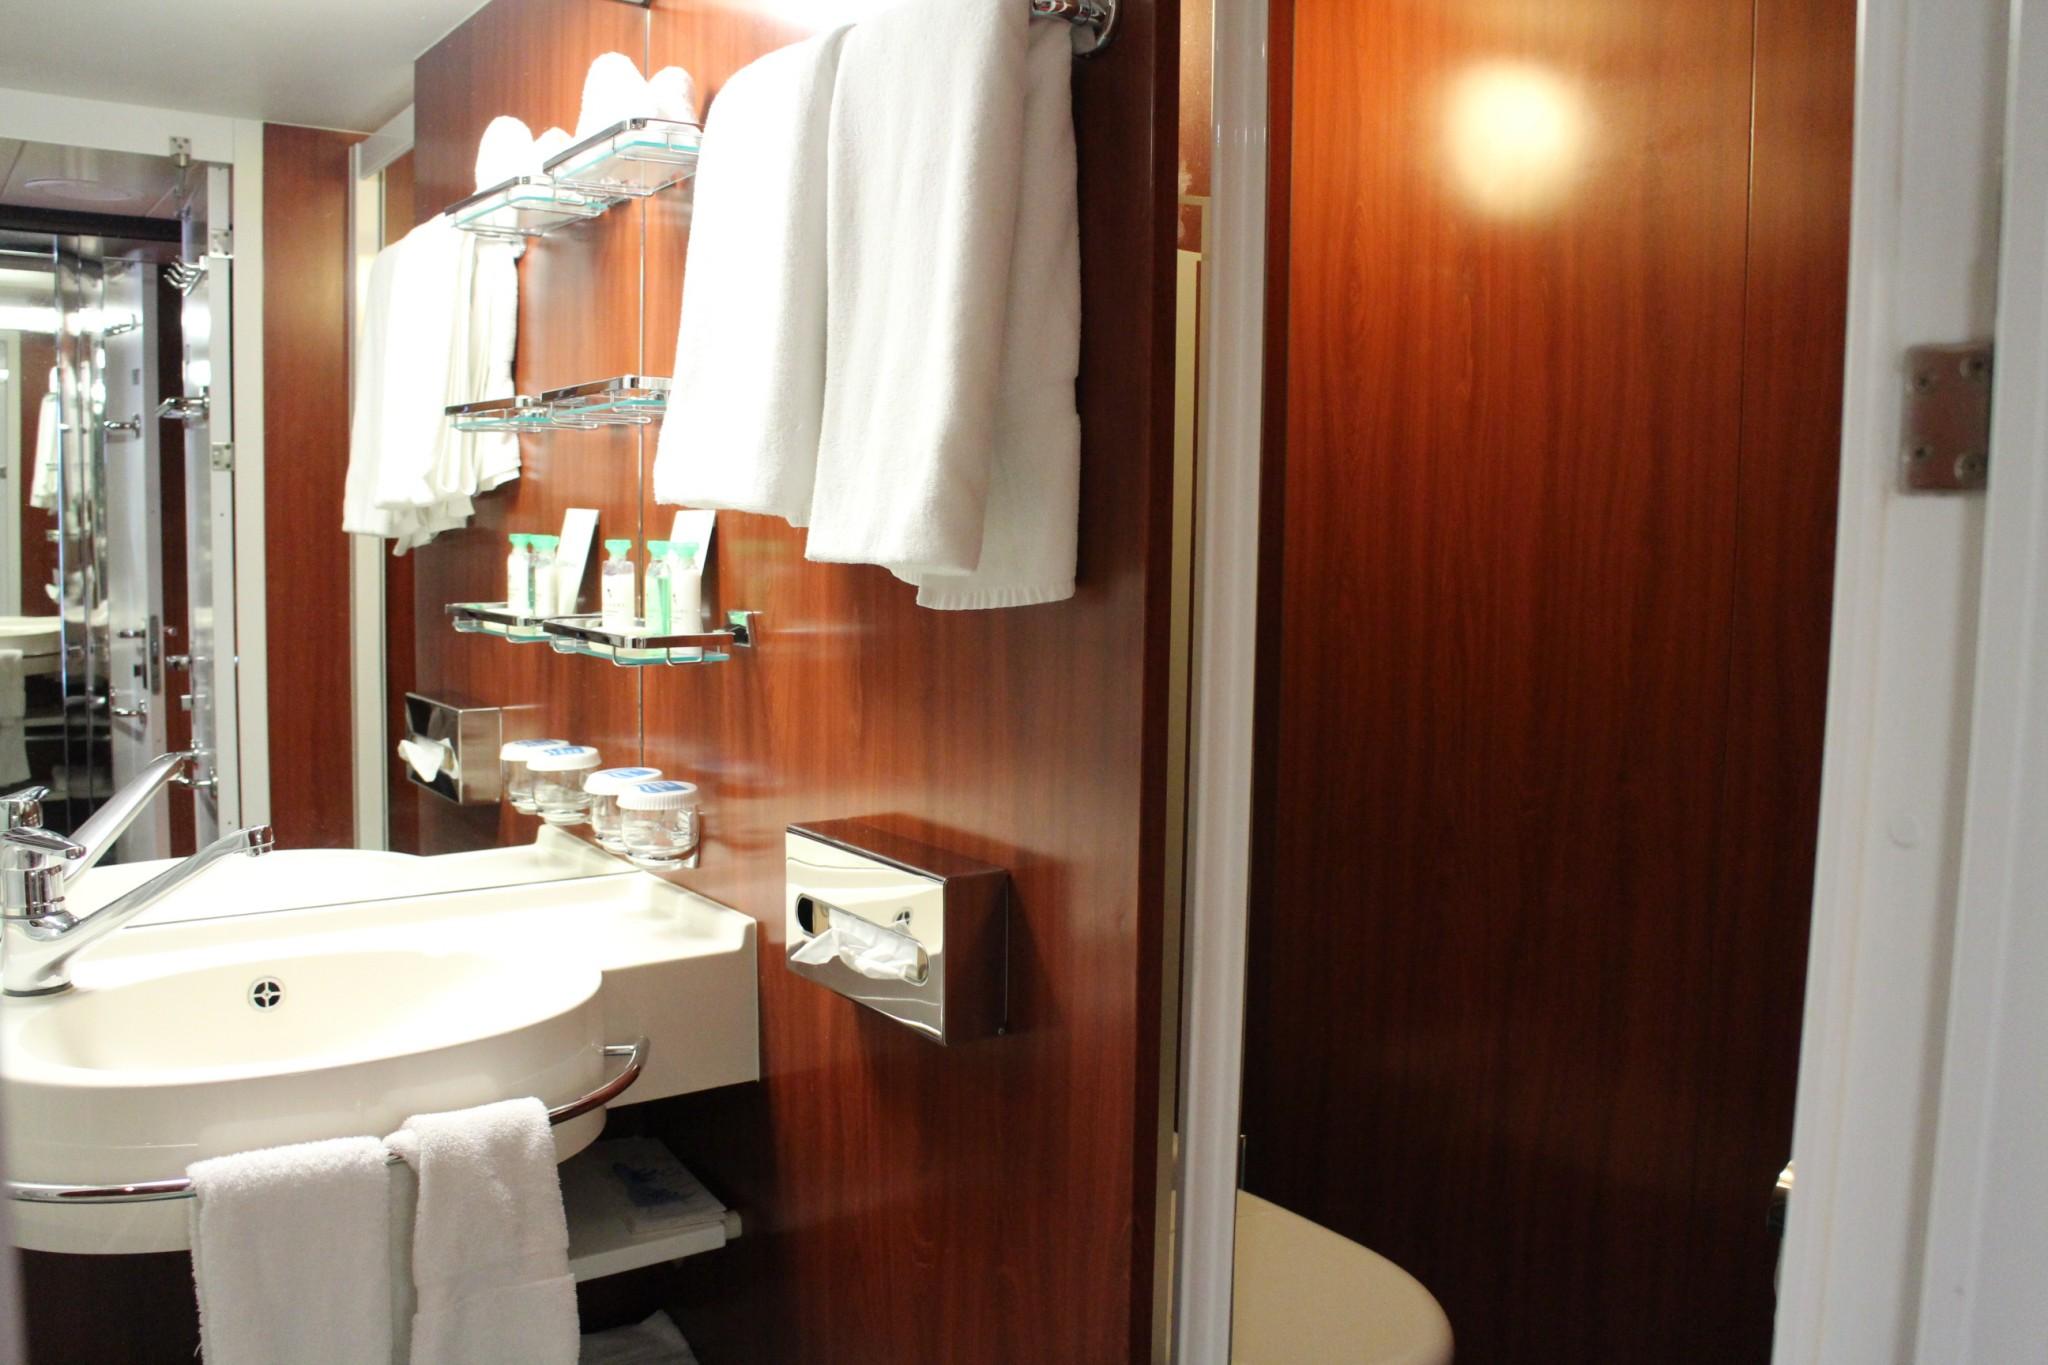 Norwegian Jewel Forward Penthouse with Large Balcony bathroomn2